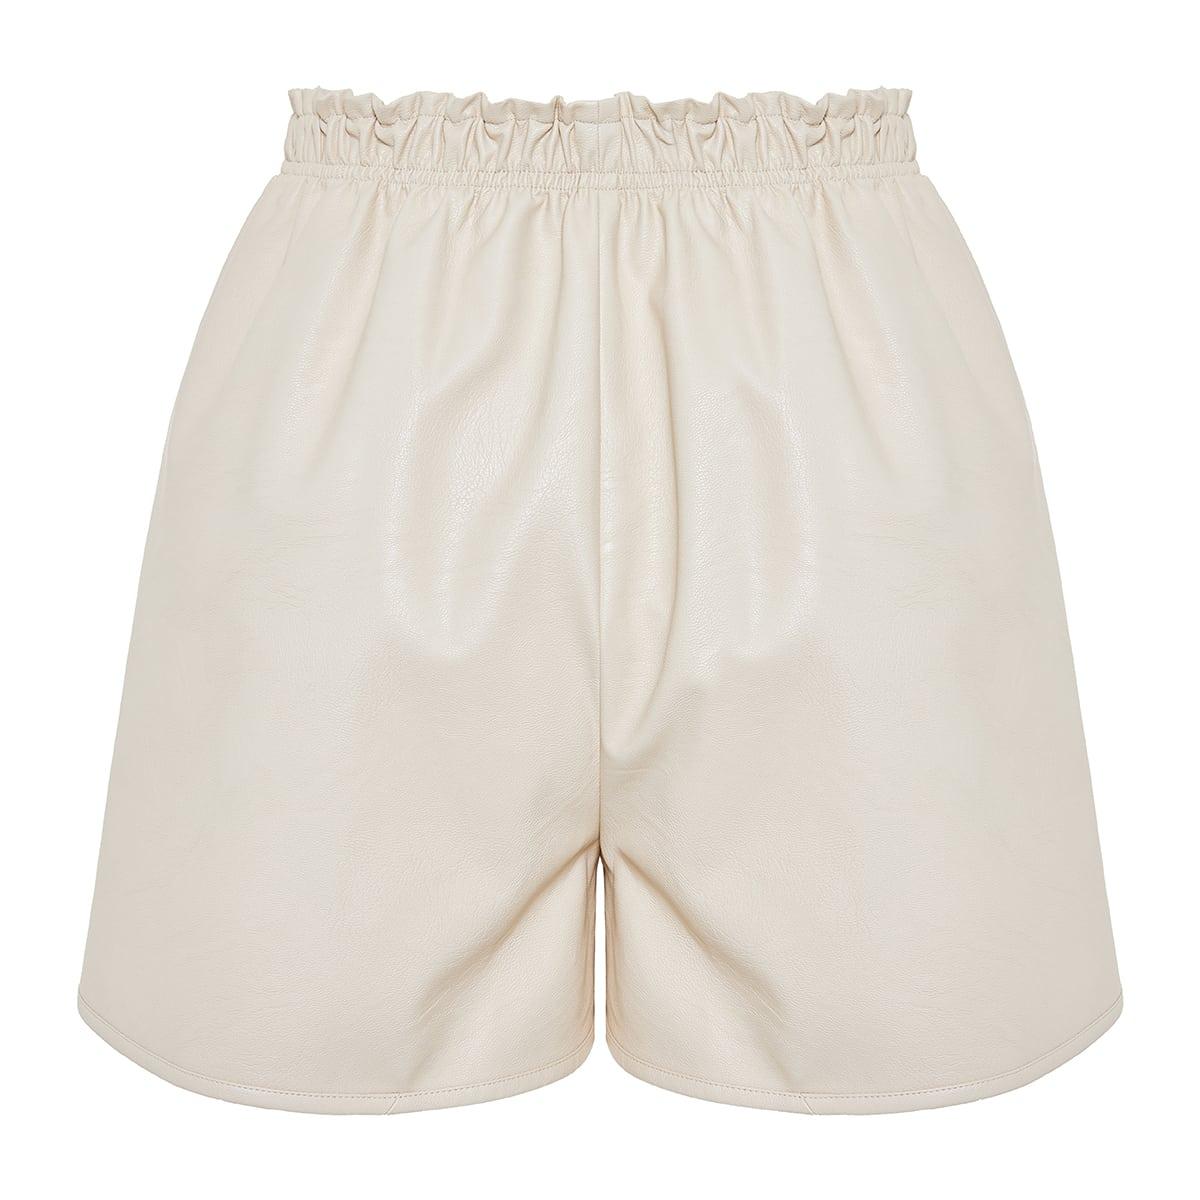 Lane faux-leather shorts